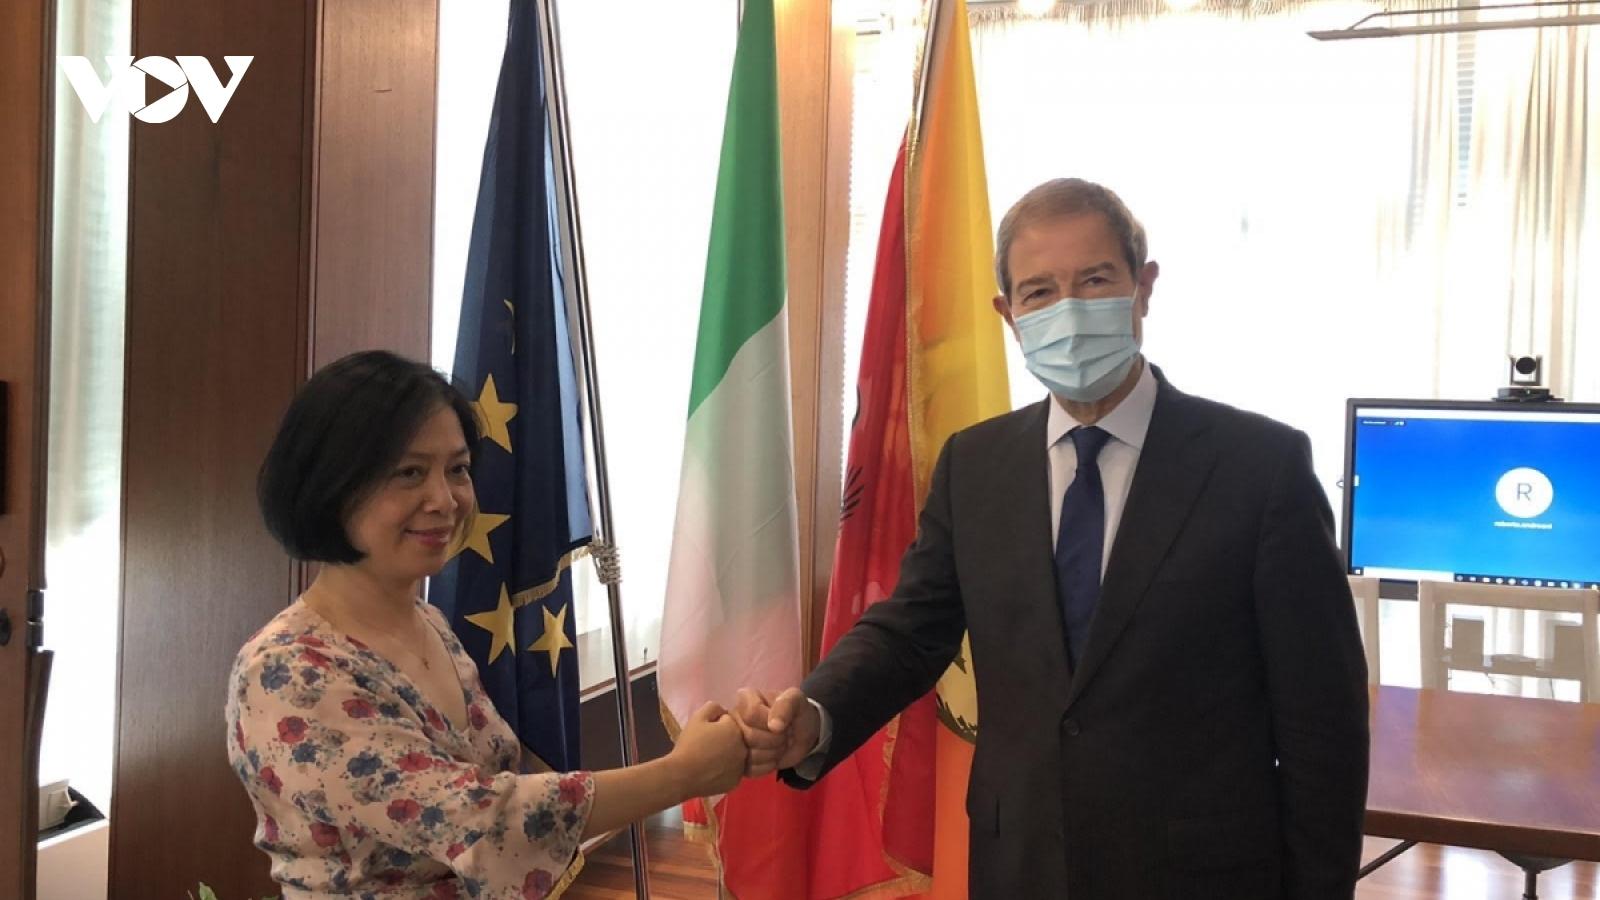 Vietnamese Ambassador aims to bolster co-operation with Italian region of Sicily